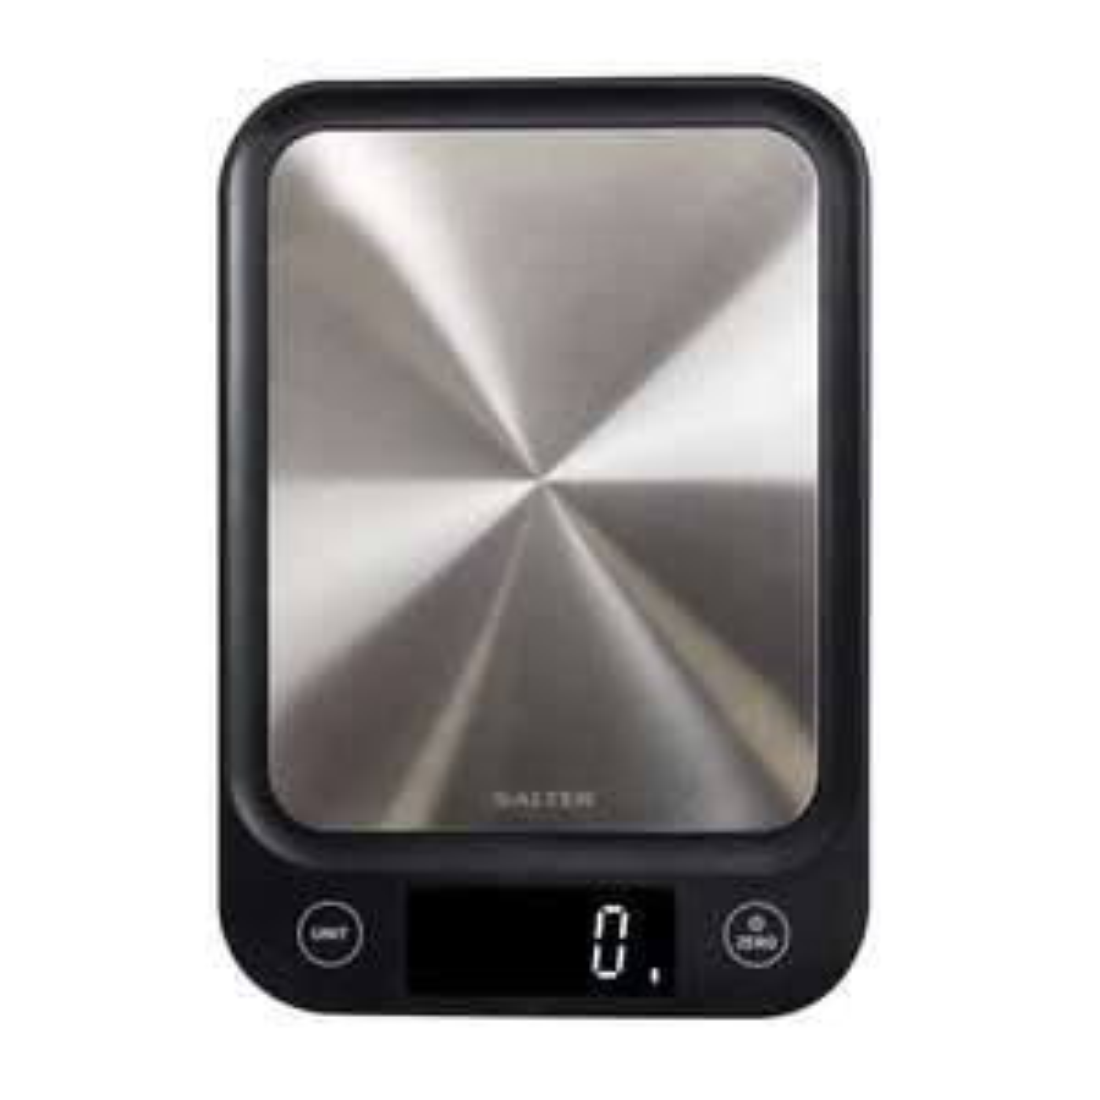 Salter Digital Kitchen Scales - £10 Prime / £14.49 non Prime @ Amazon.co.uk